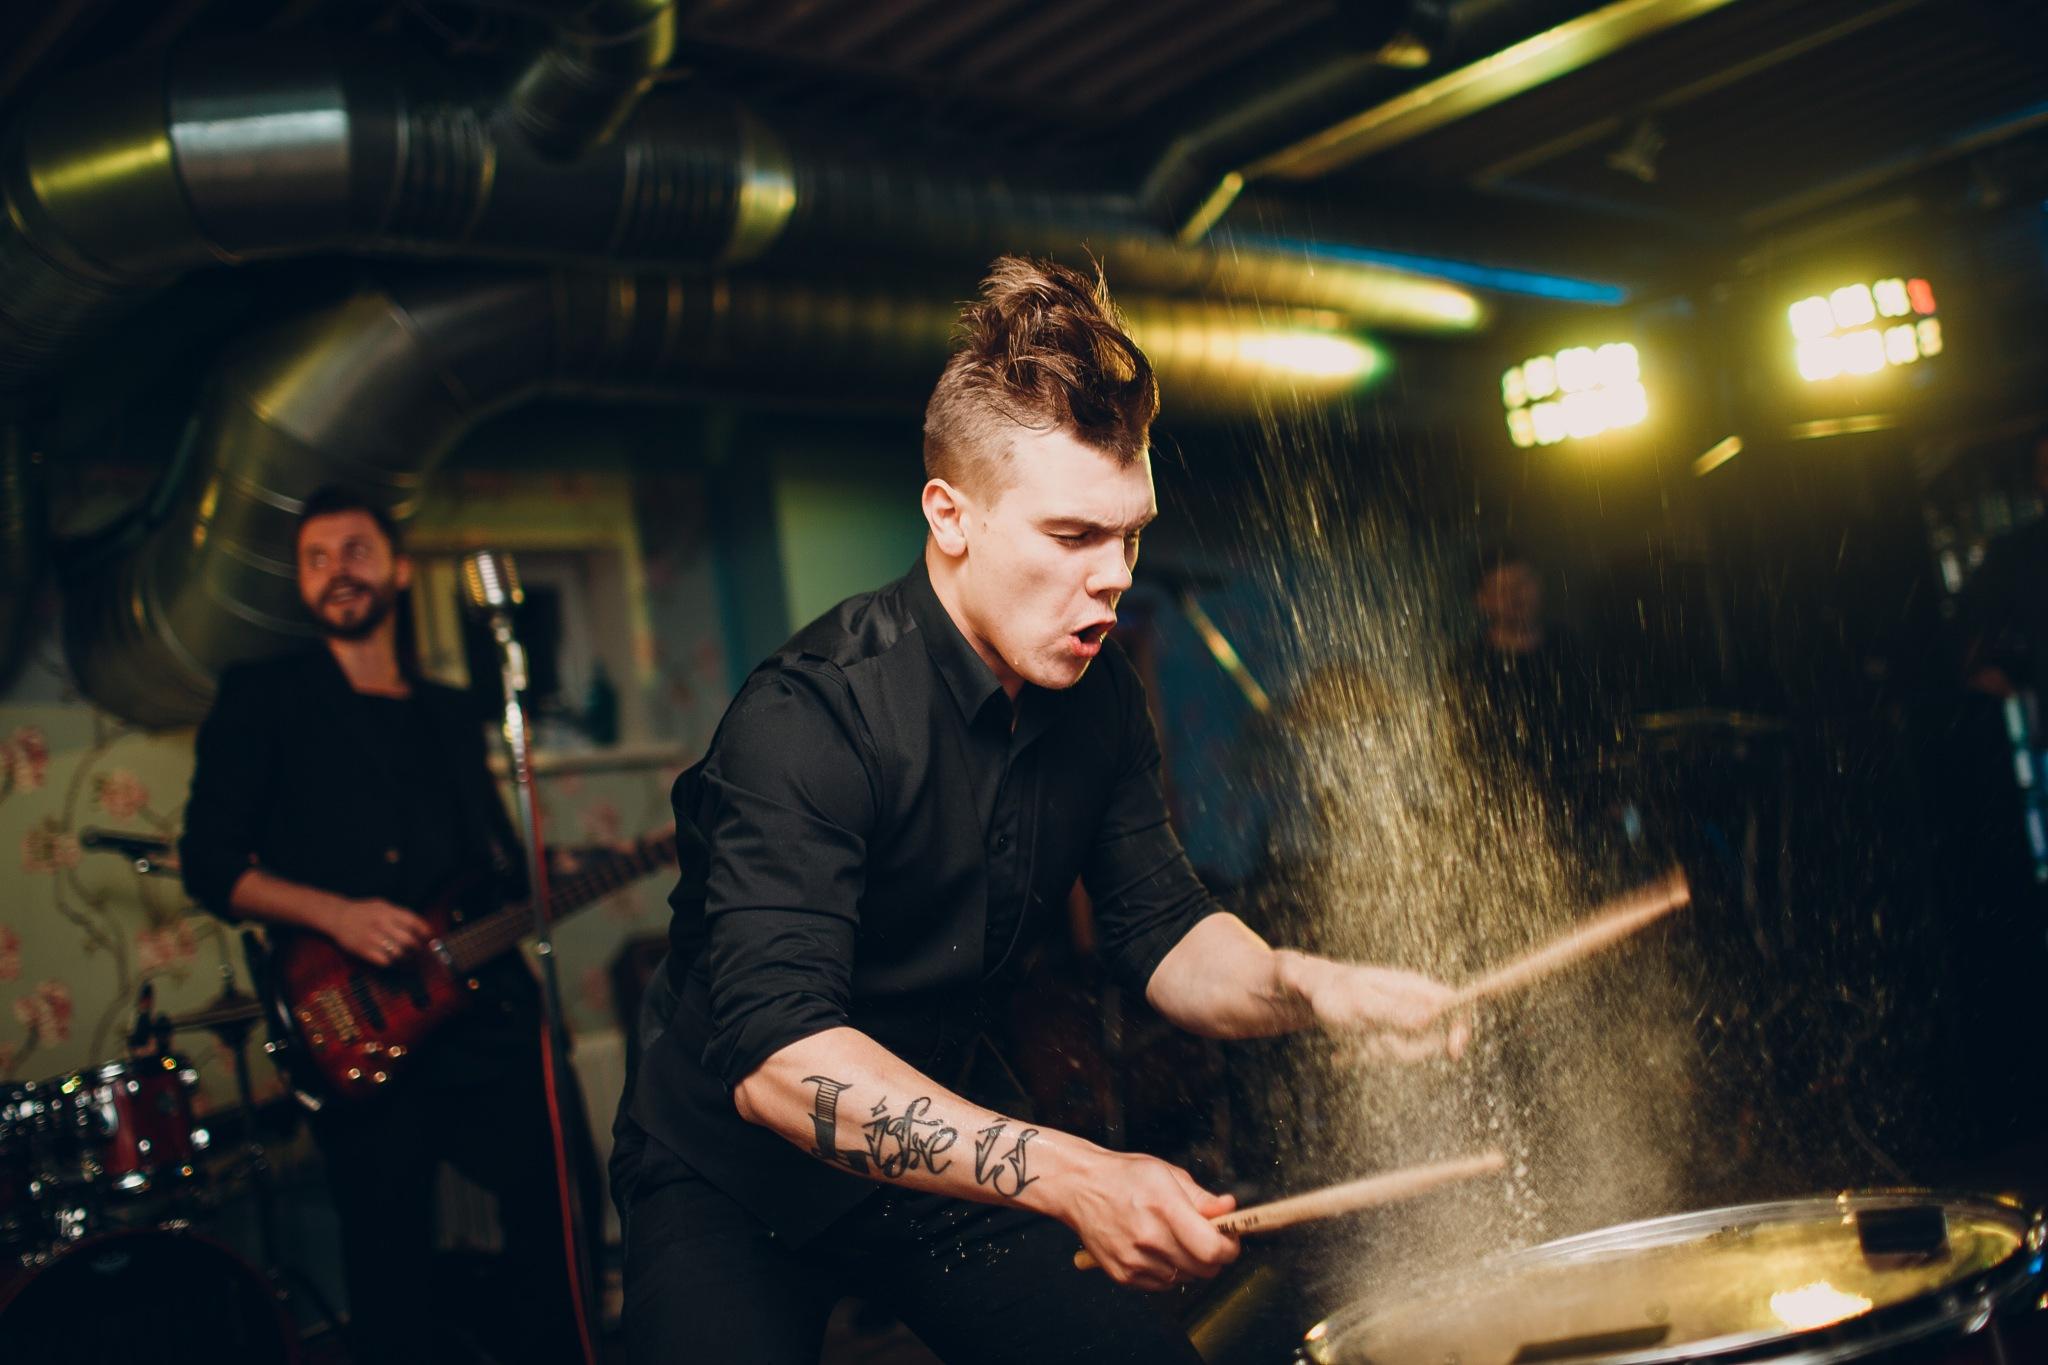 Drummer by atercorv